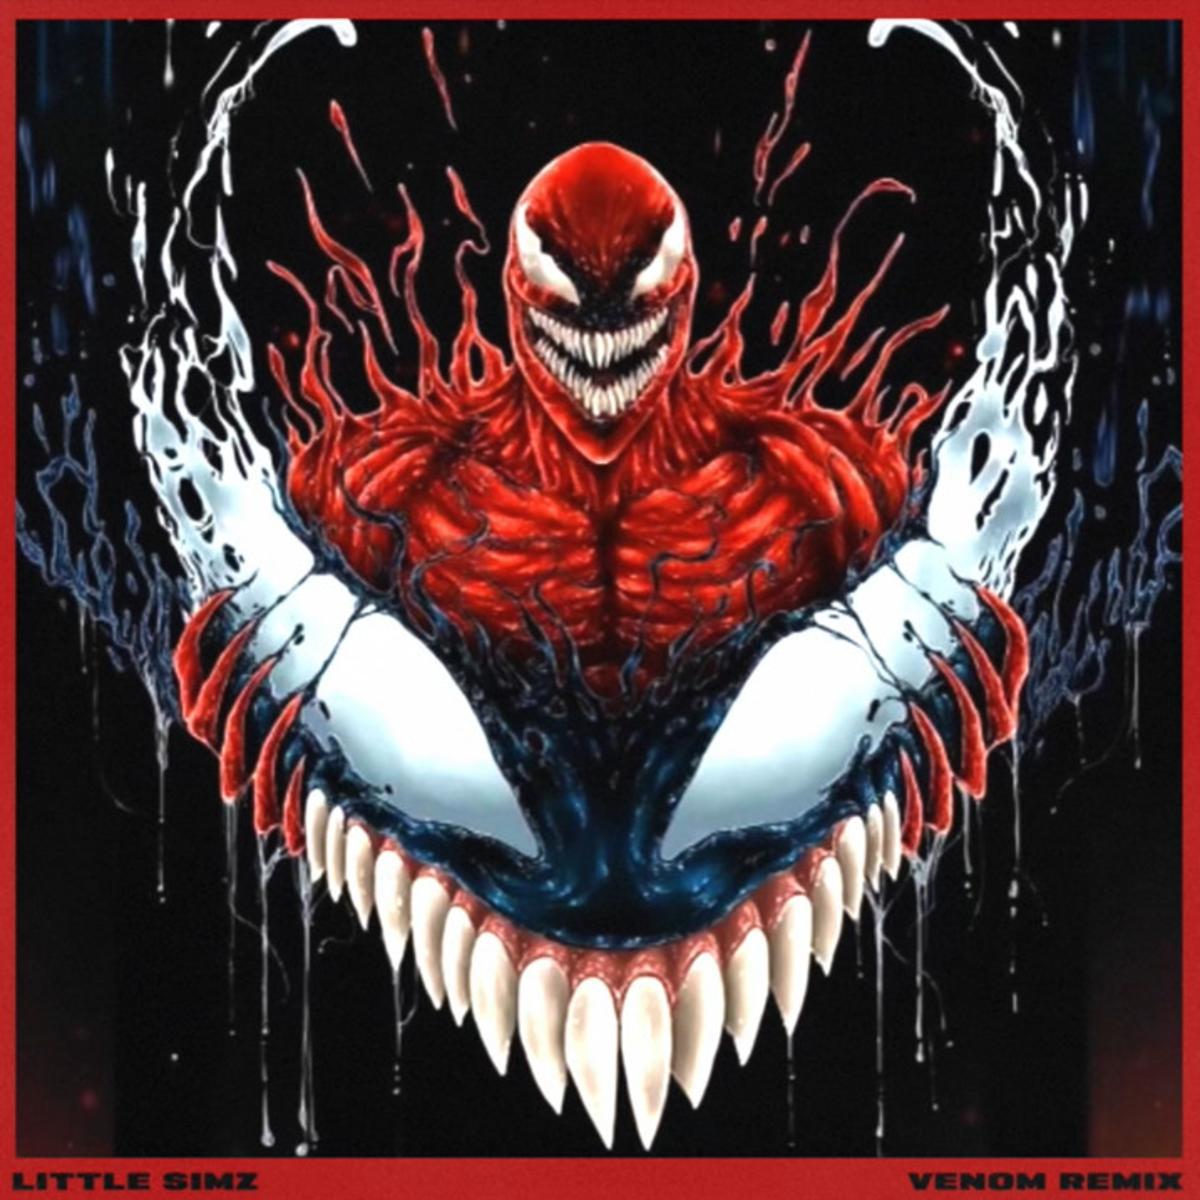 MP3: Little Simz - Venom (Remix)